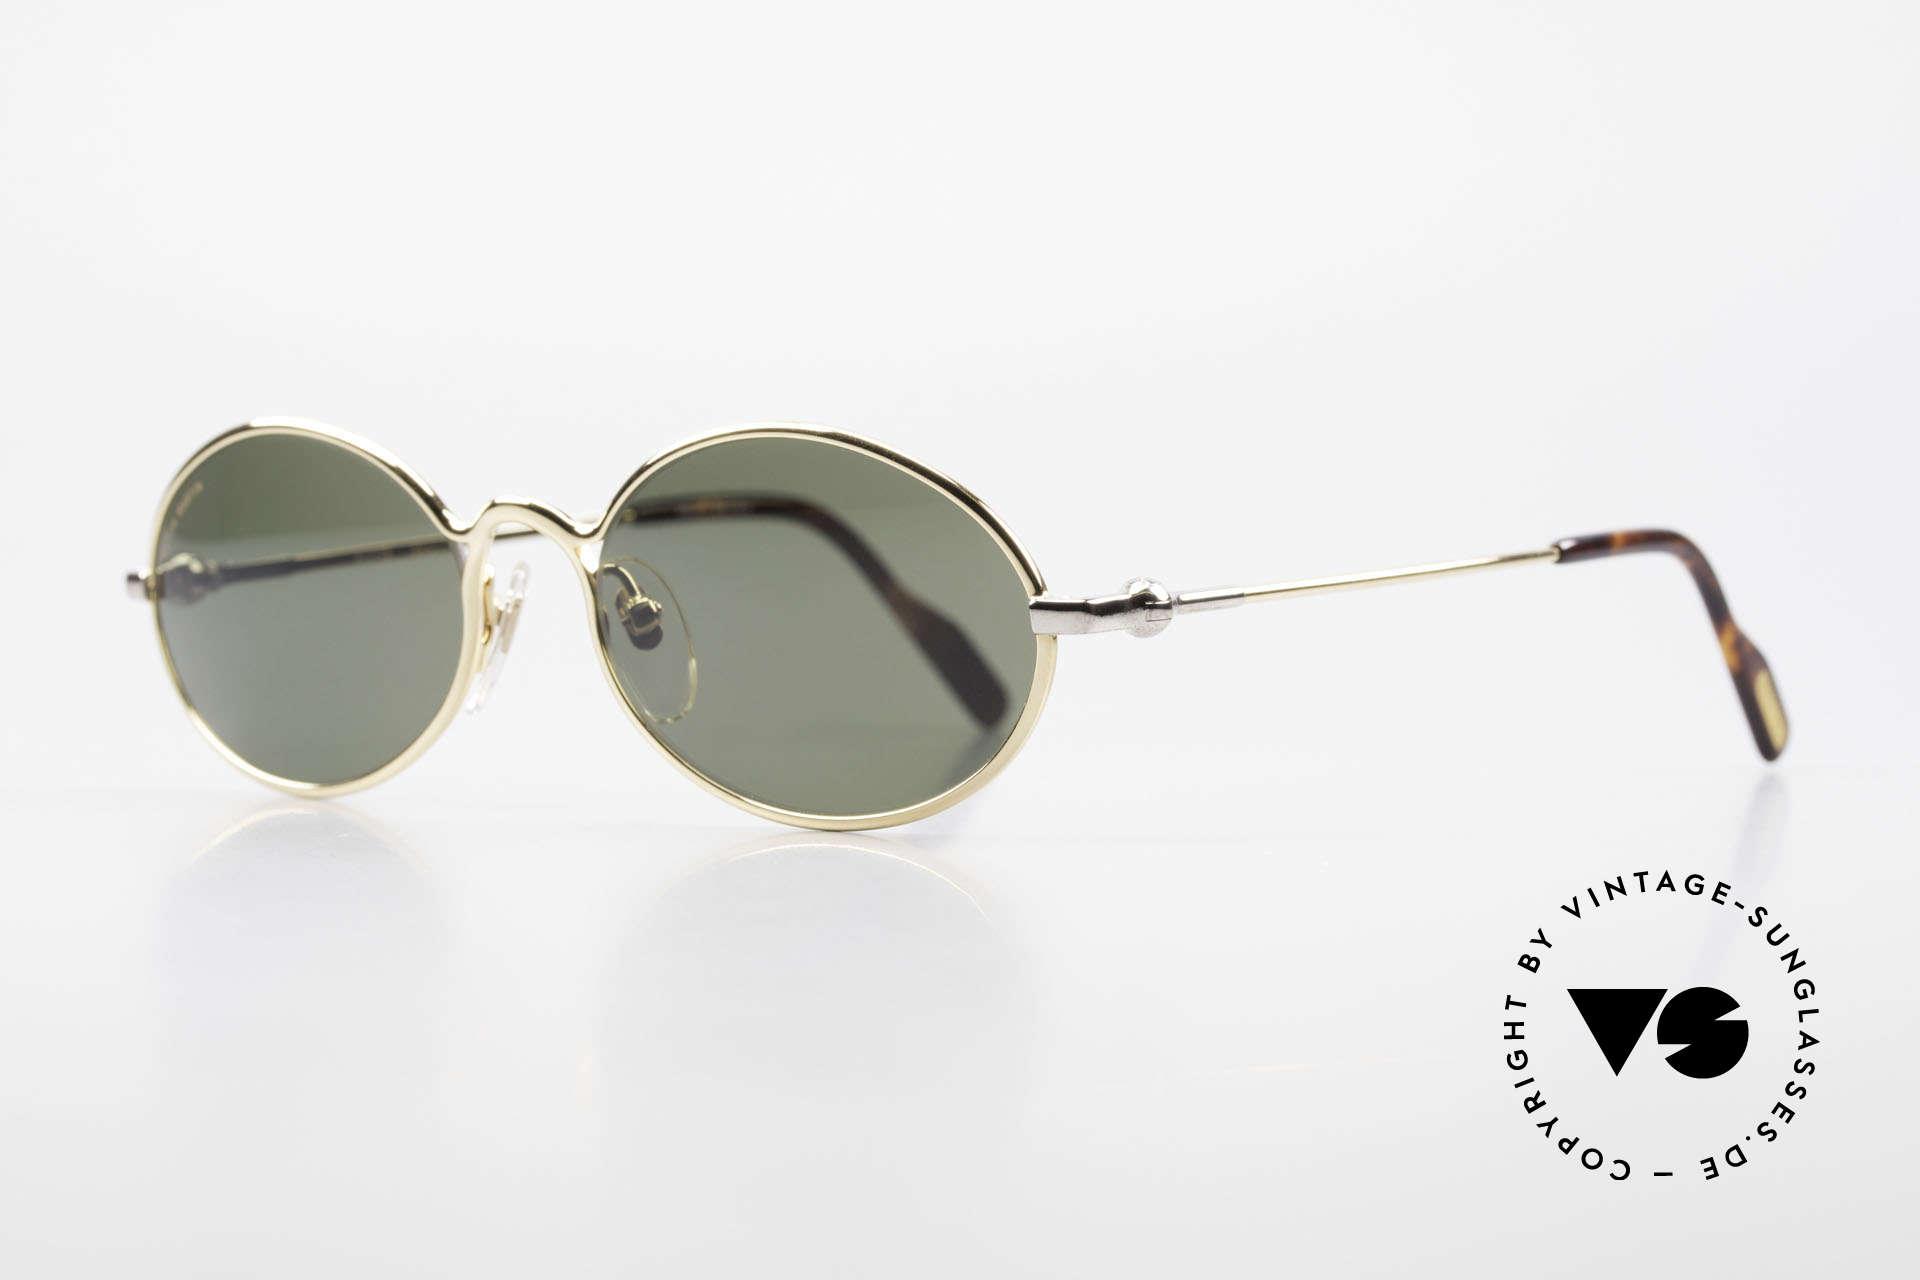 Aston Martin AM13 Oval Sunglasses James Bond, sporty and elegant classic: James Bond 'gentlemen style', Made for Men